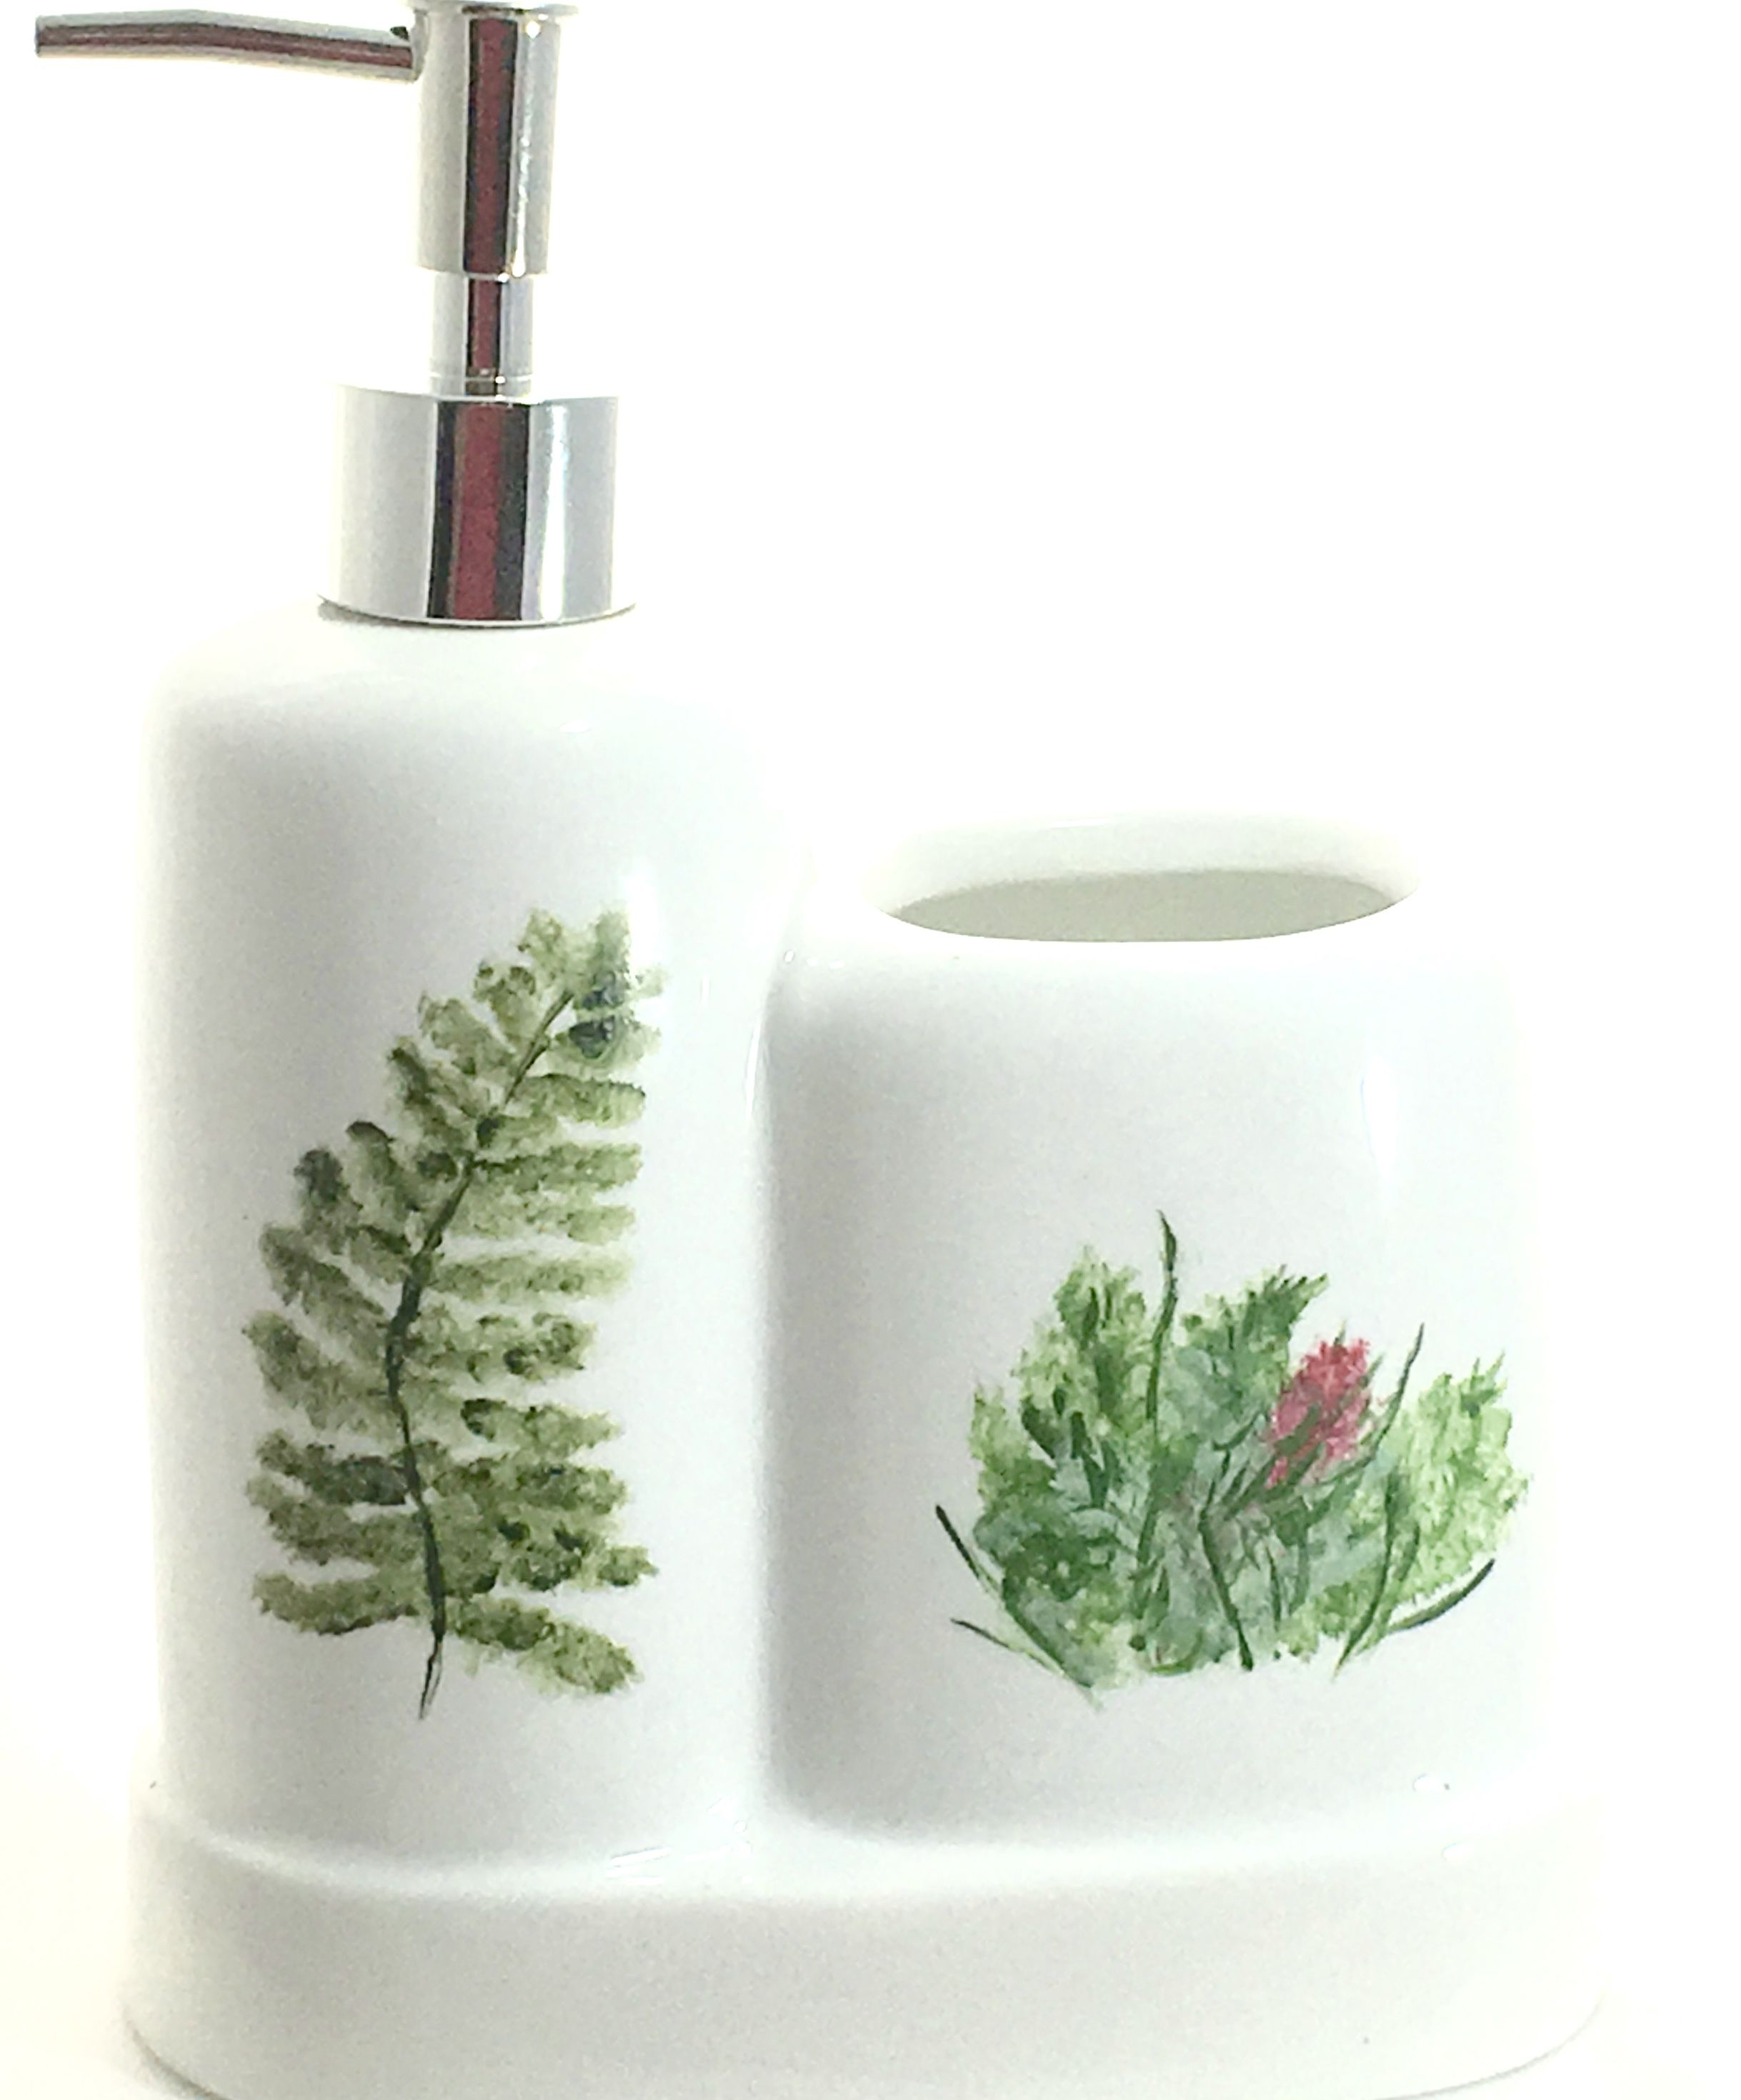 Porcelain Soap Dispenser Toothbrush Holder Yellow Flowers  http://handpainted-glasses.com/shop/fernbrpiece